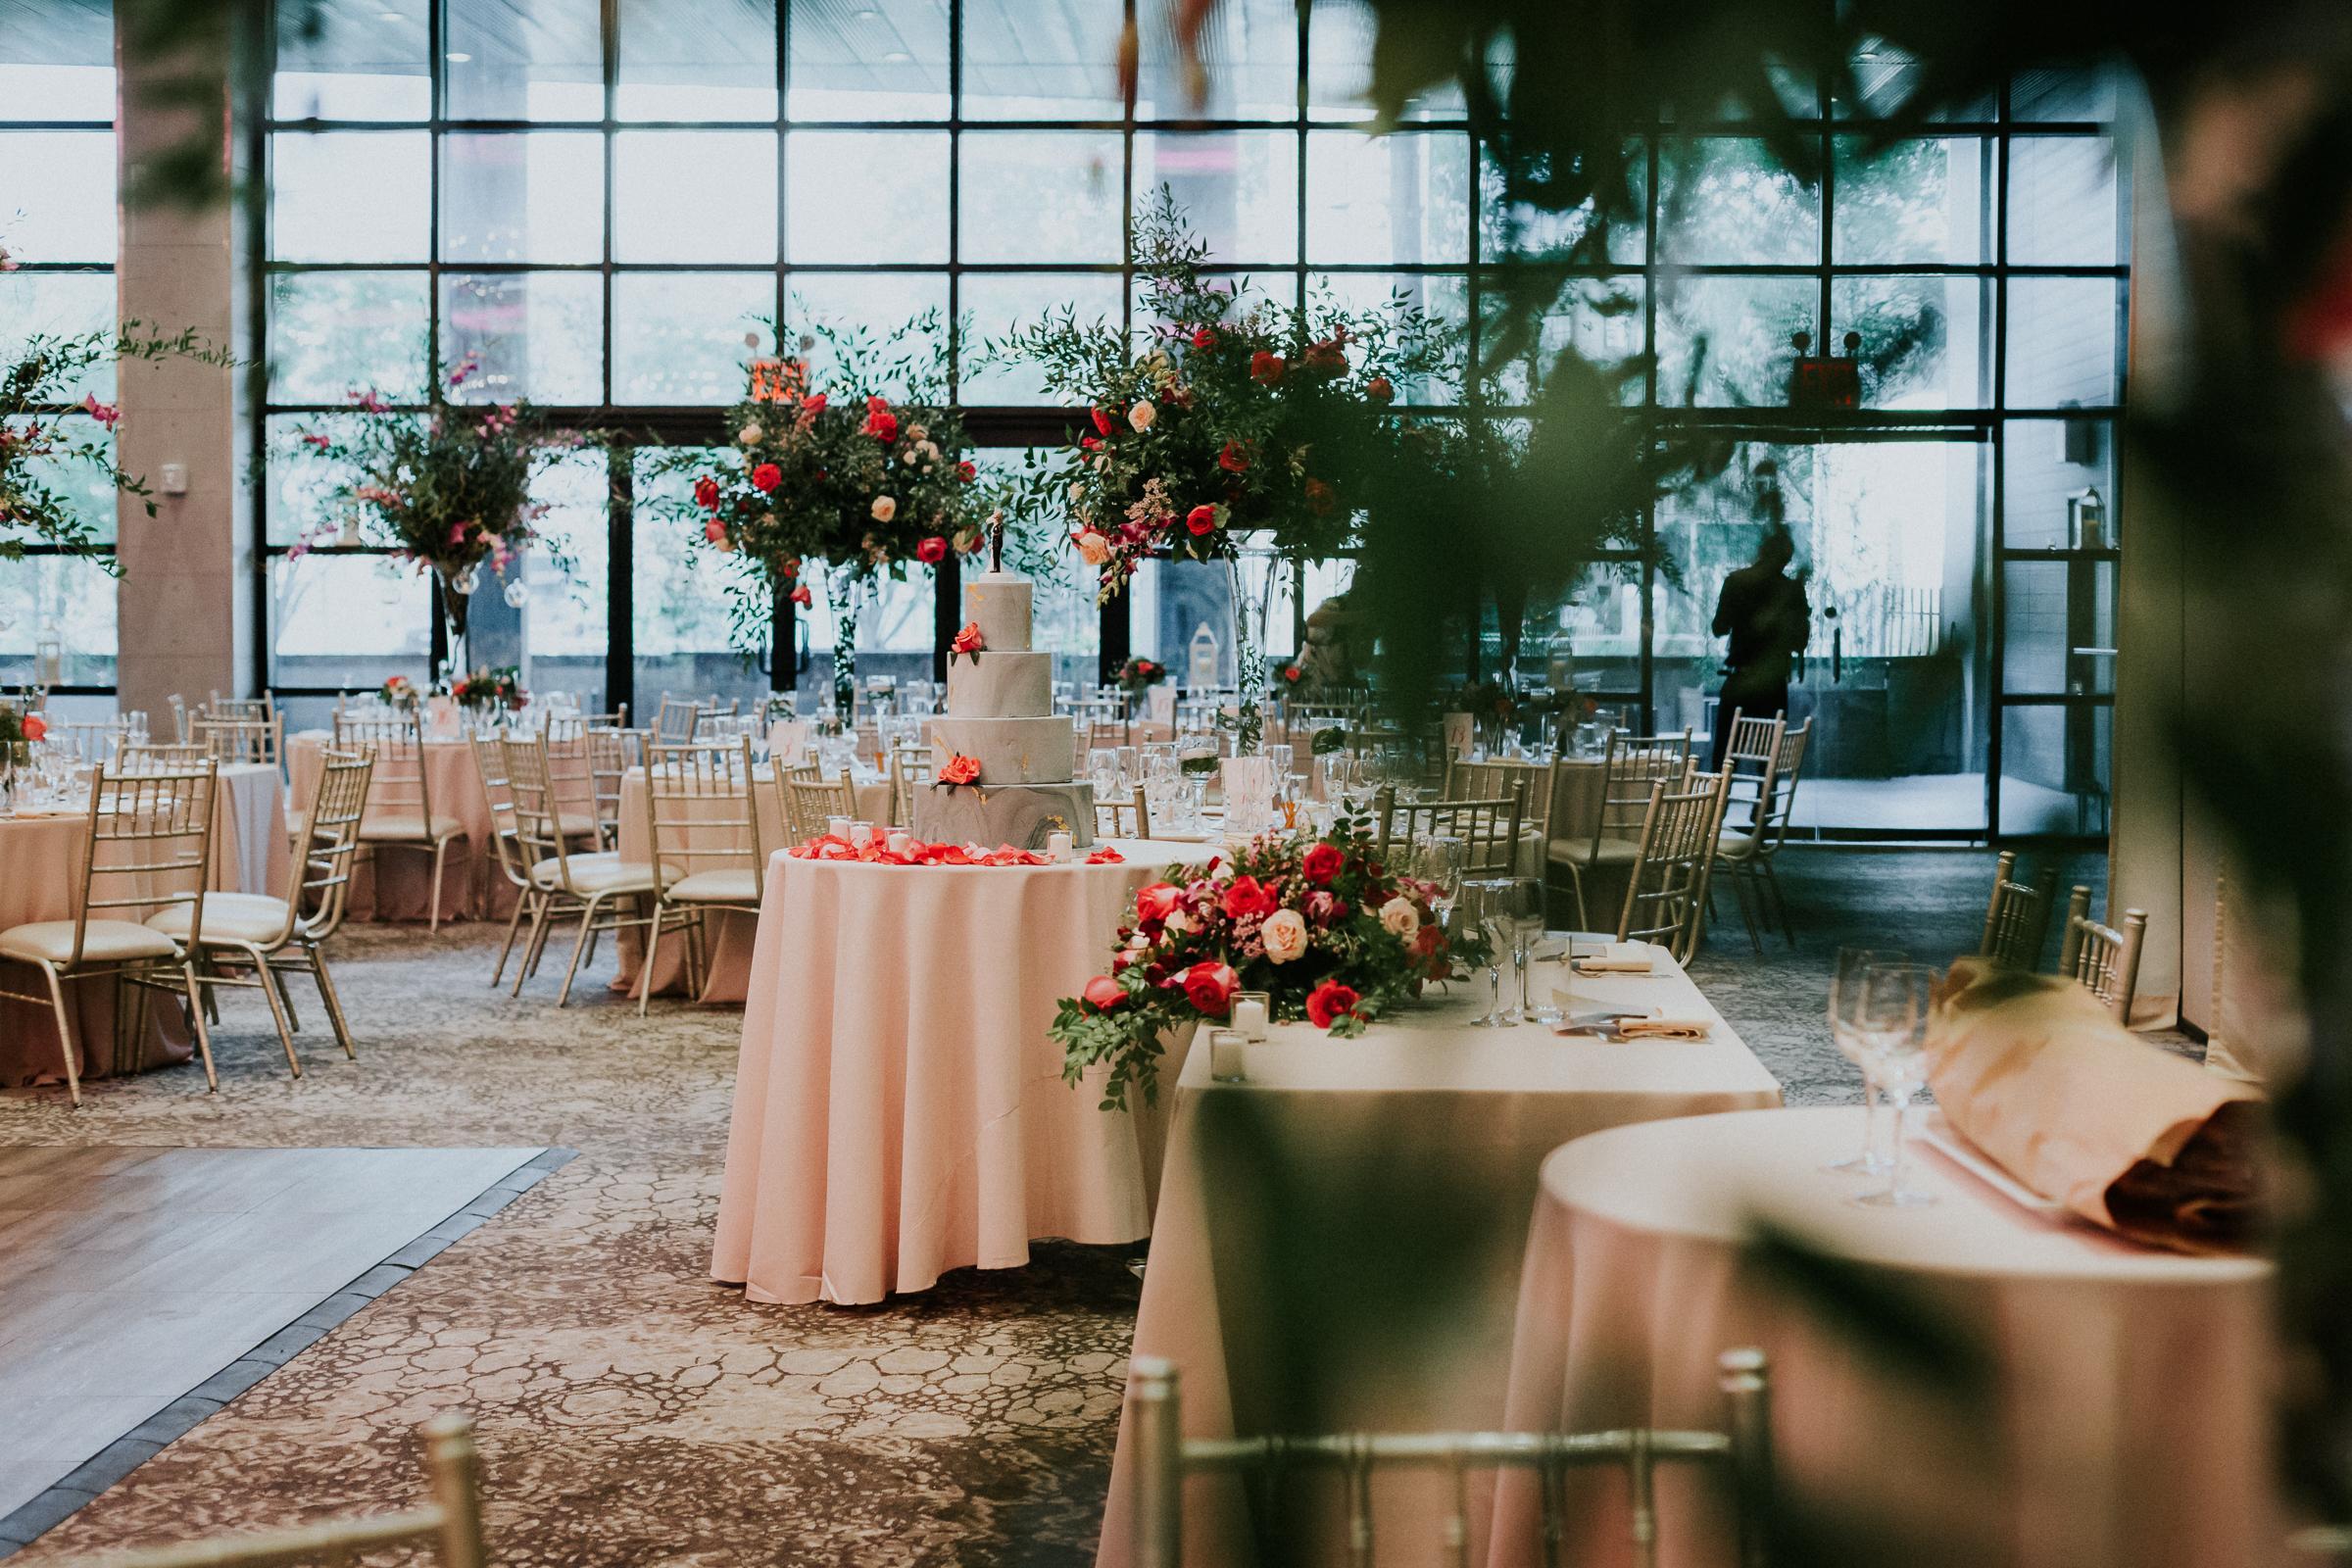 Ravel-Hotel-Penthouse-808-Long-Island-City-New-York-Documentary-Wedding-Photographer-82.jpg